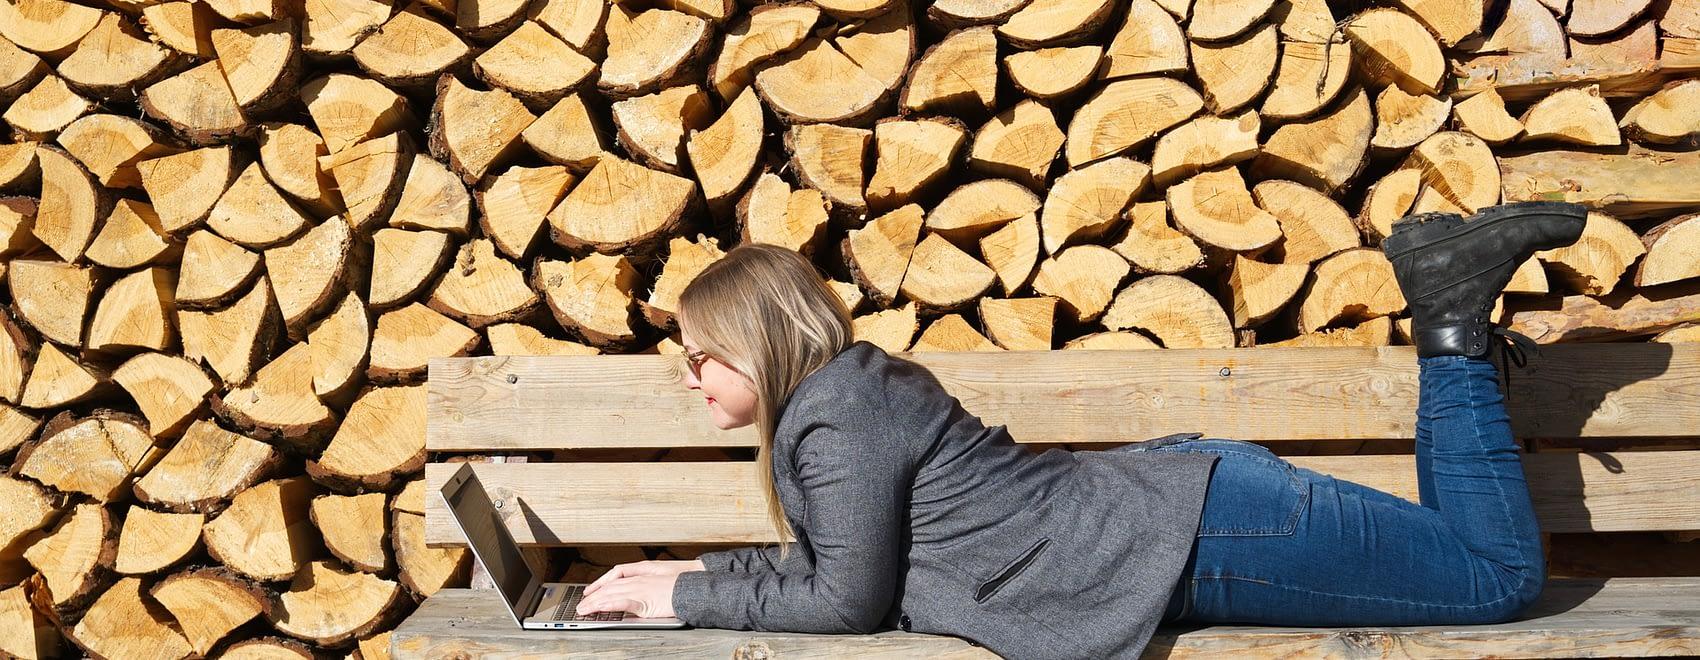 adjusting to remote work life